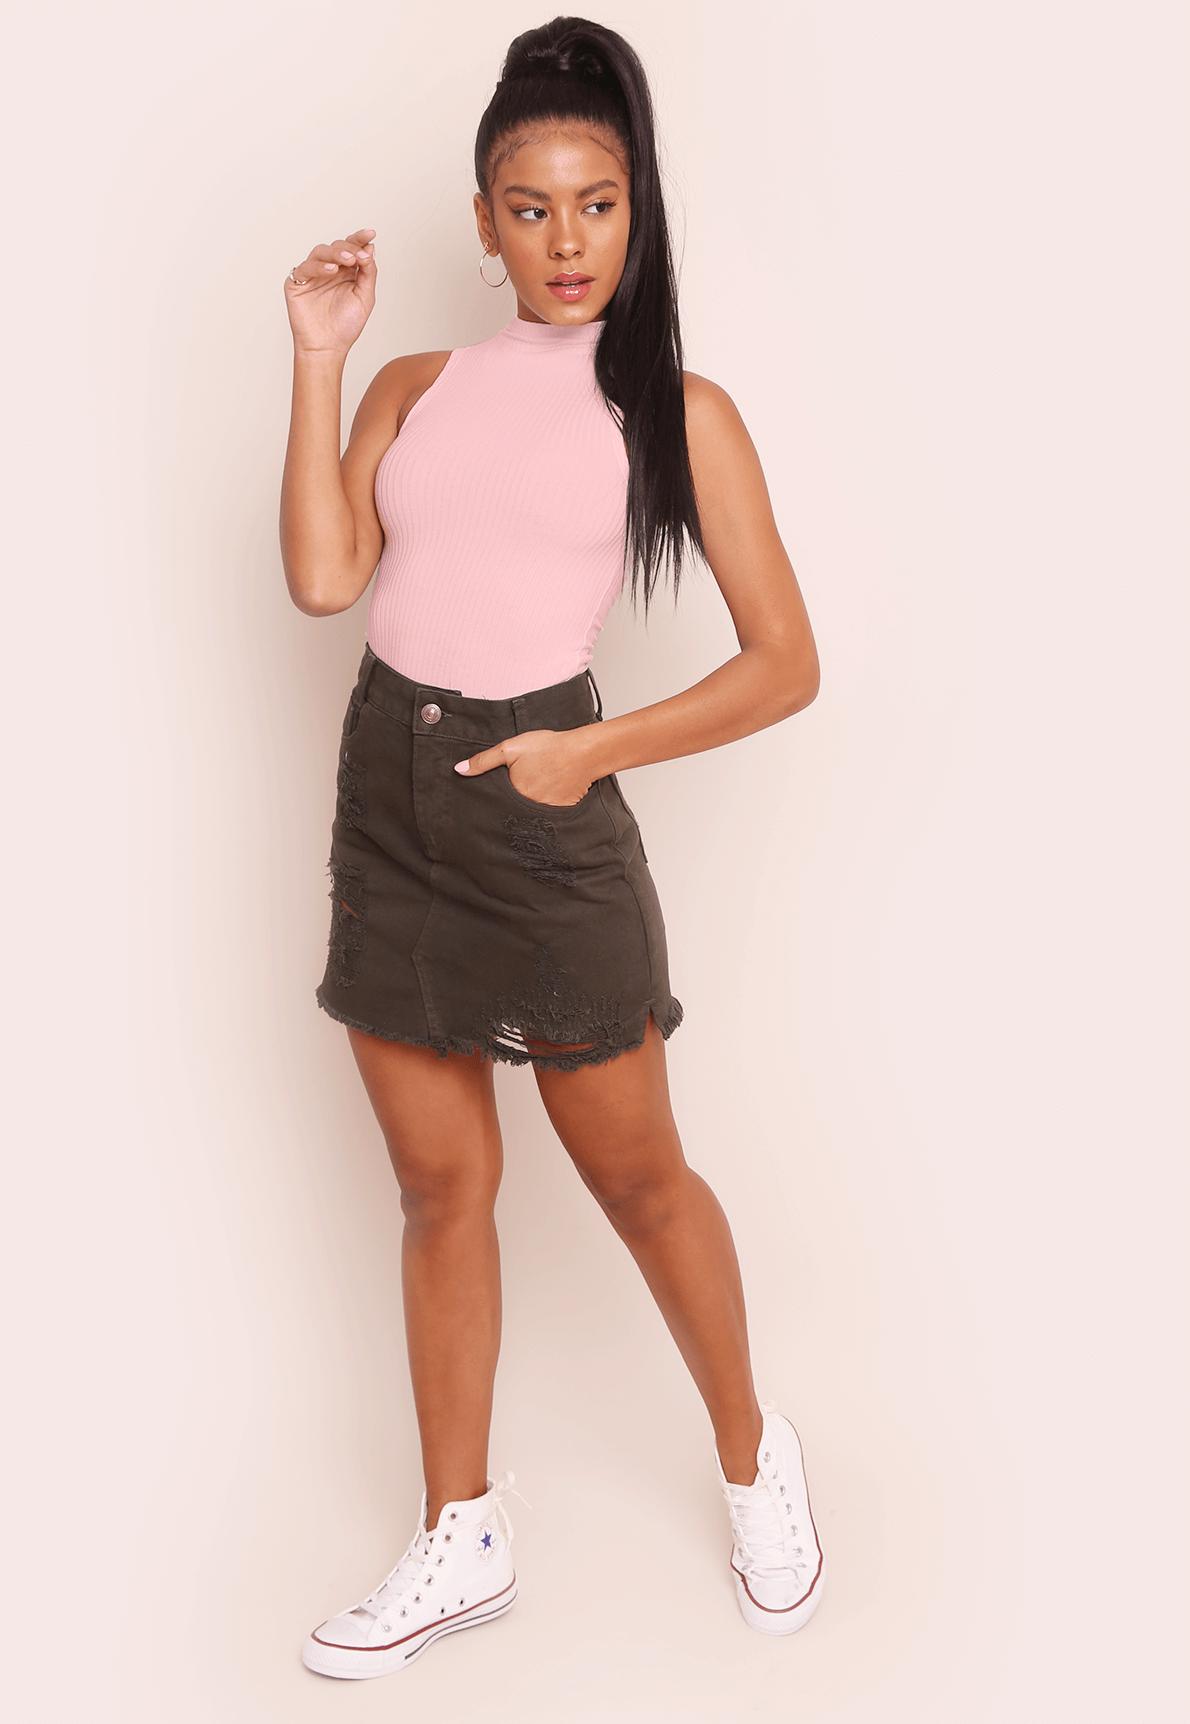 33901-Regata-Carol-rose-mundo-lolita-02